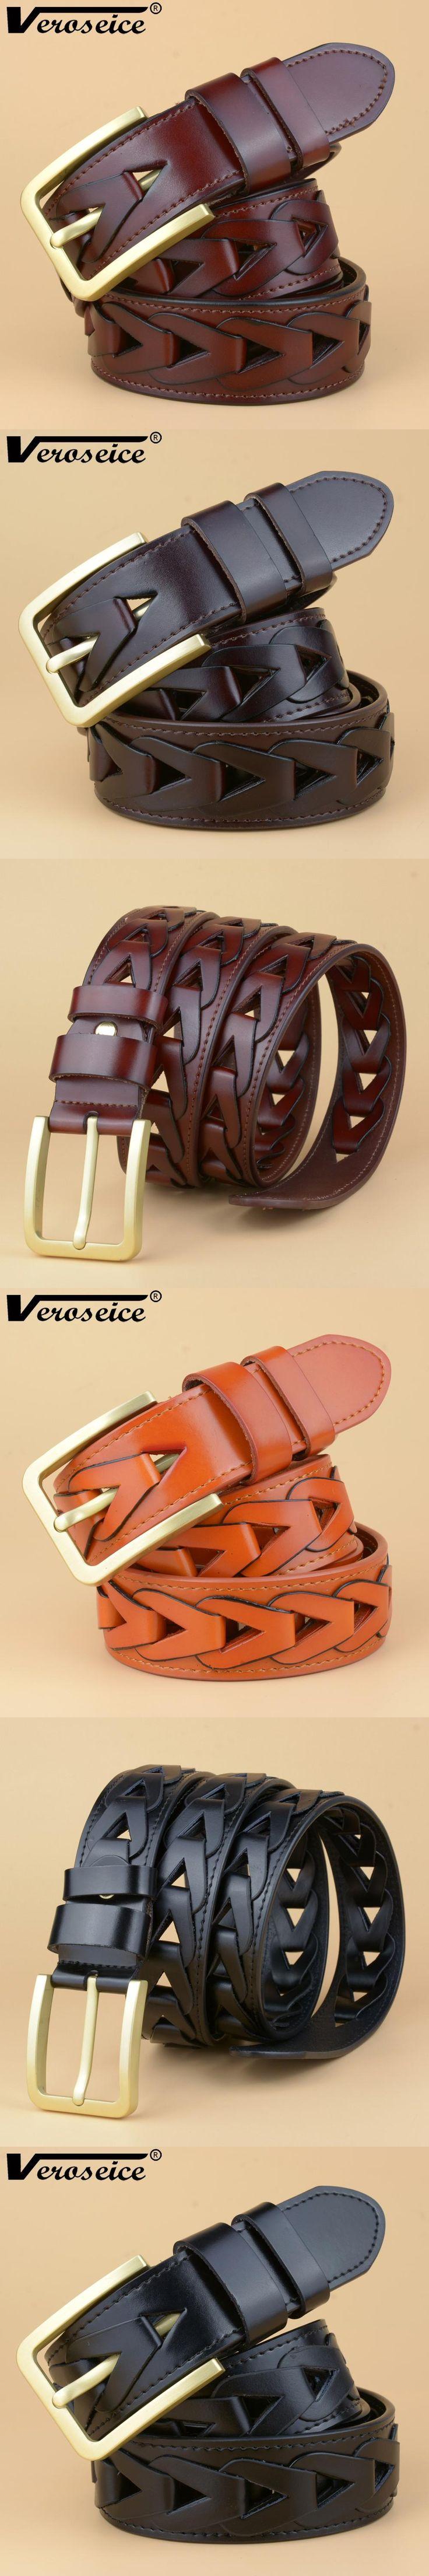 [Veroseice ] New Style Good Quality Genuine leather Belts for men Fashion Vintage Male Brass Pin Buckle Weavon Men Belt Cinto